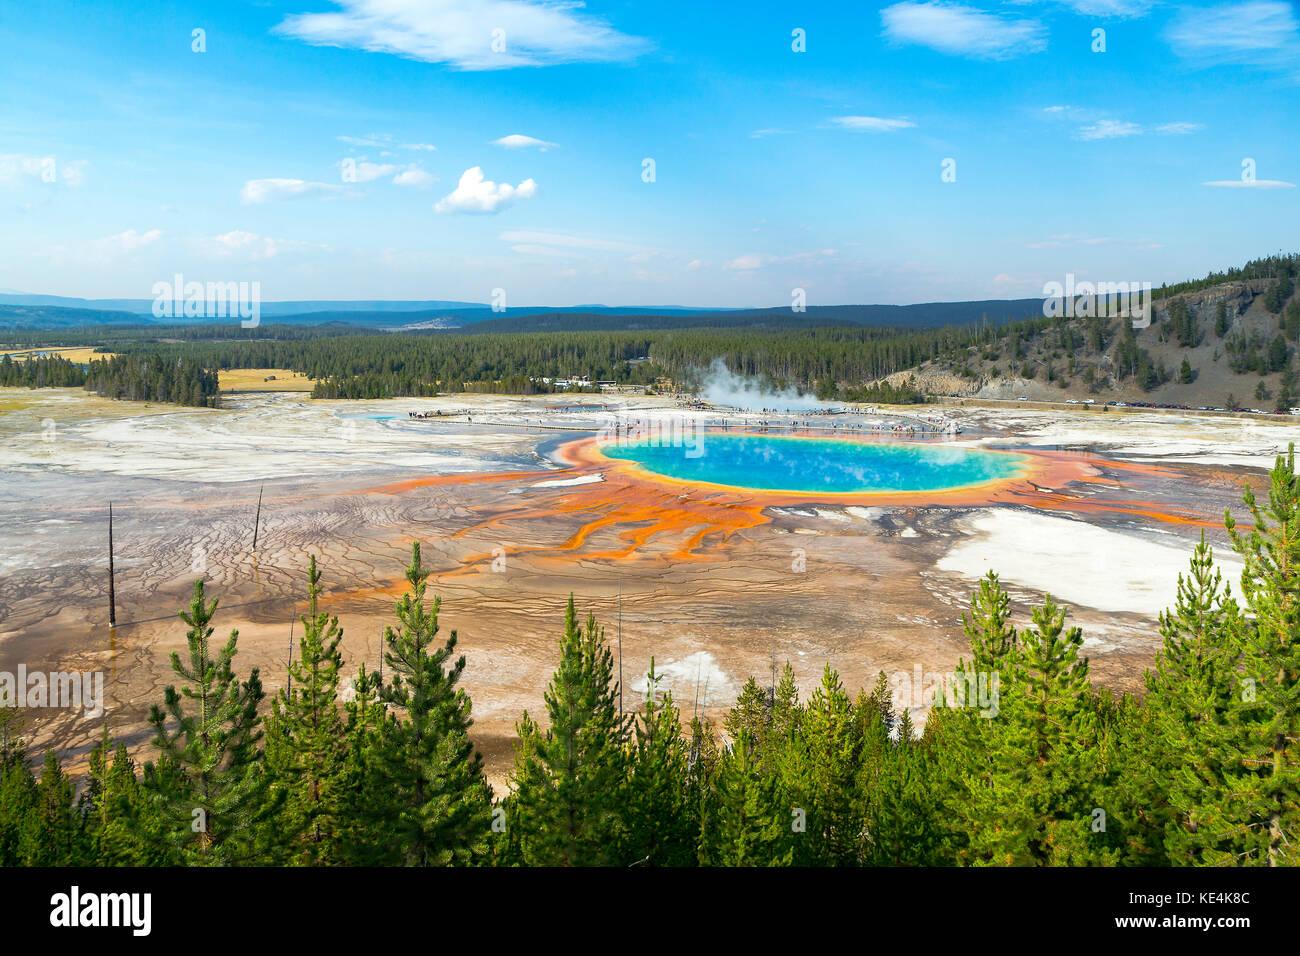 USA Yellowstone nationl park, Grand Prismatic Spring - Stock Image